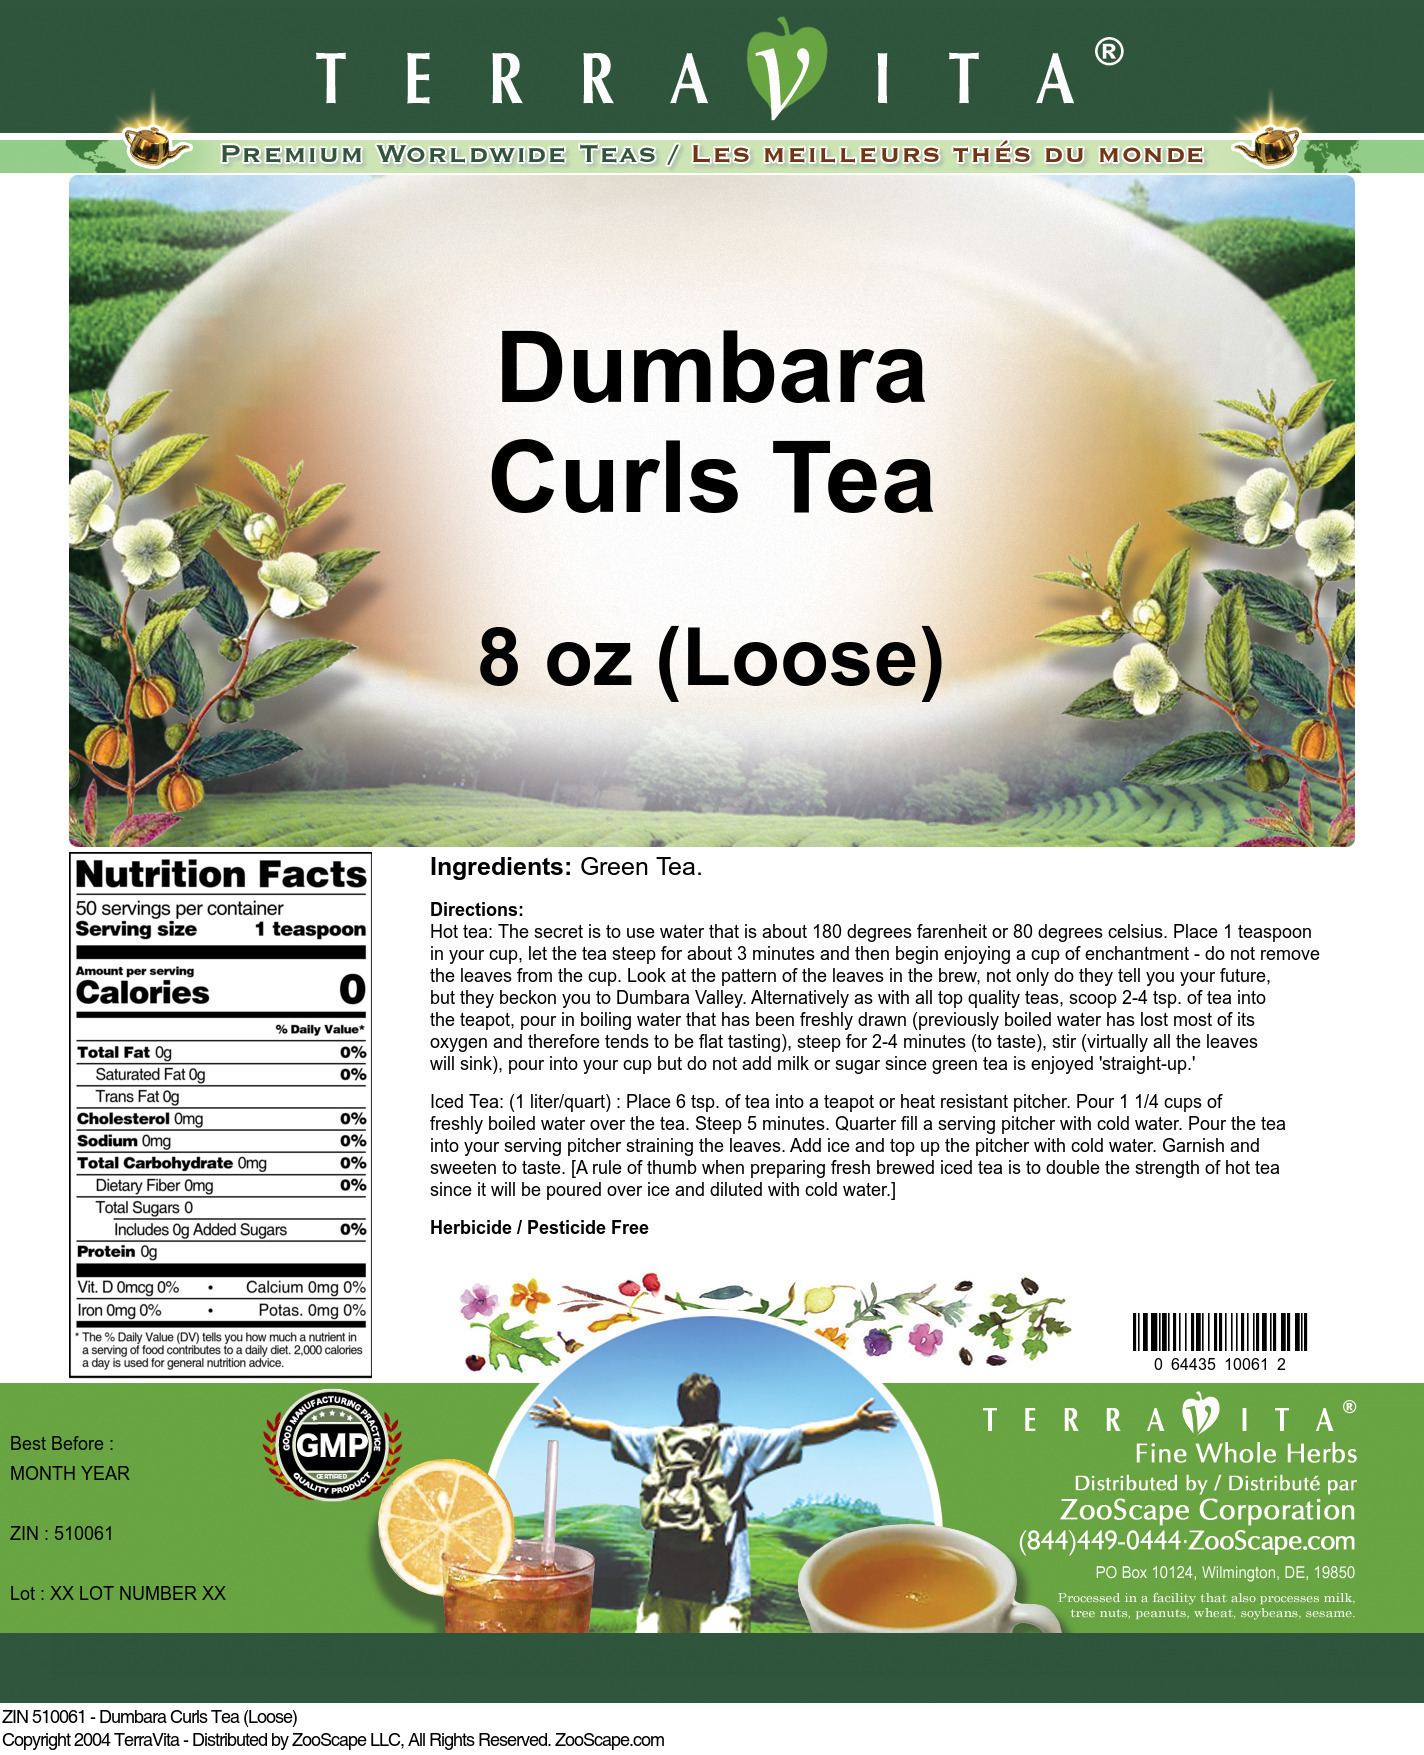 Dumbara Curls